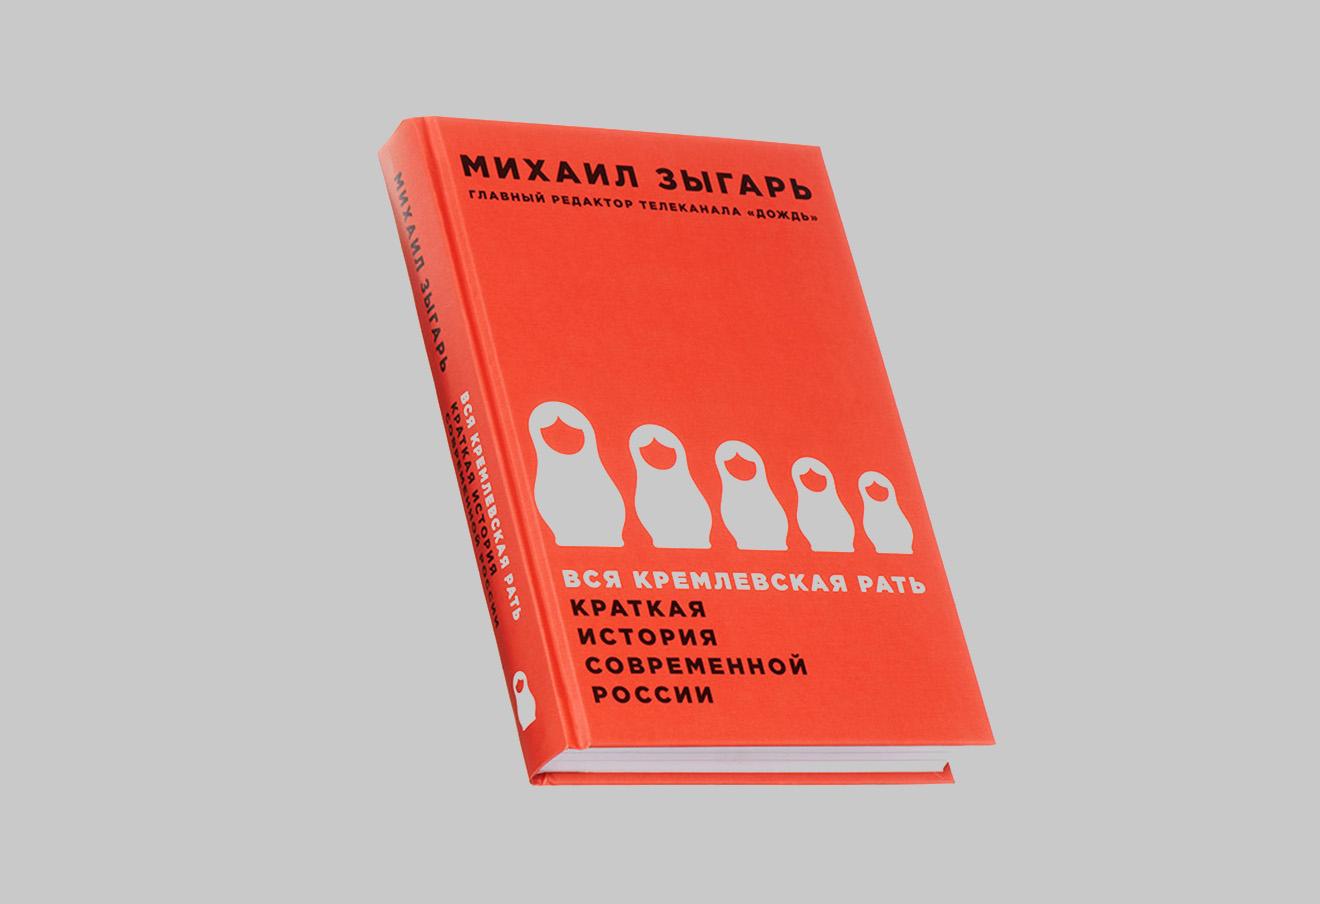 Книга Михаила Зыгаря